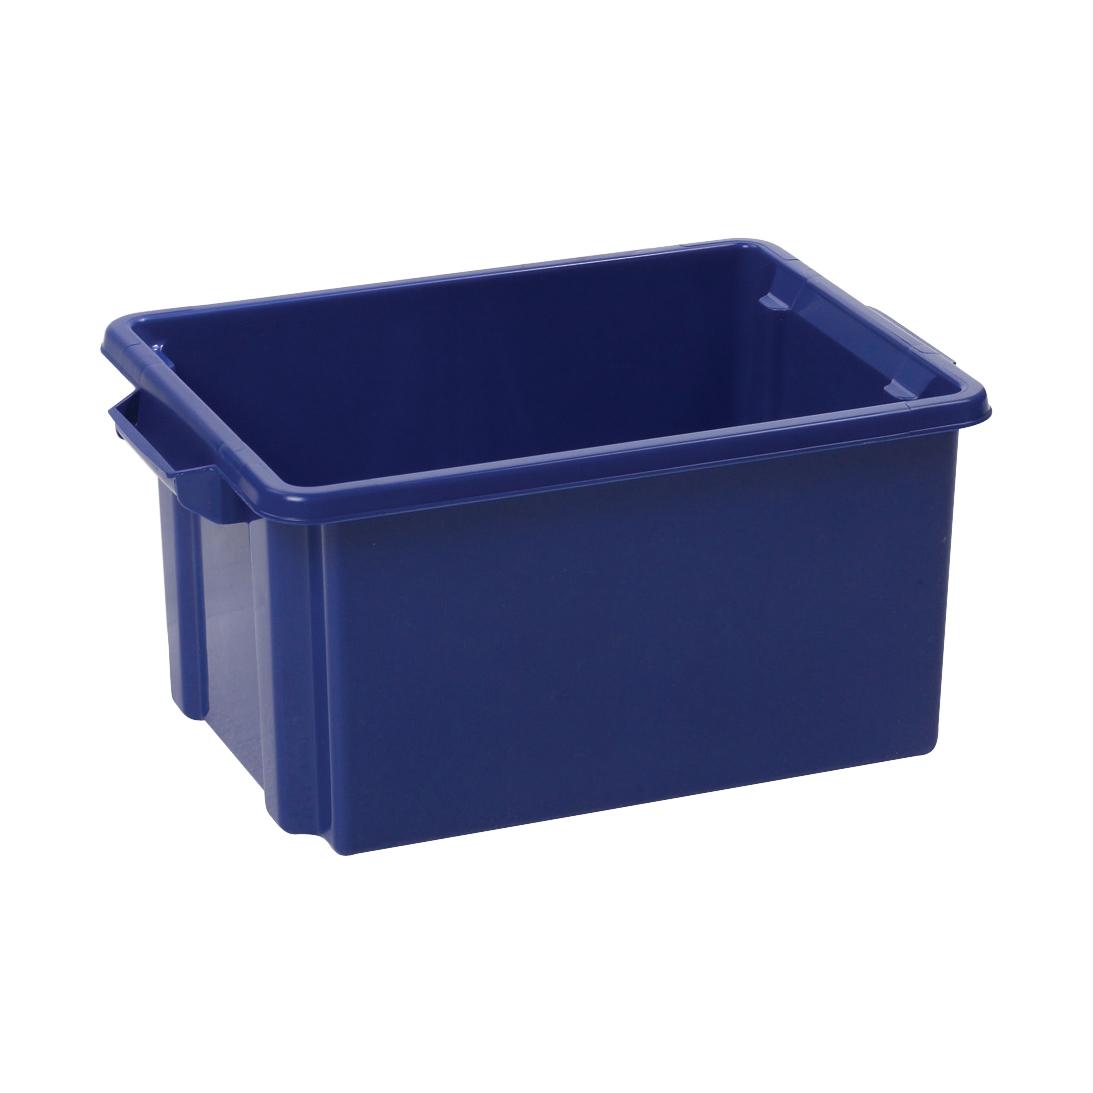 Strata Storemaster Midi Crate External W360xD270xH190mm 14.5 Litres Blue Ref HW44 BU